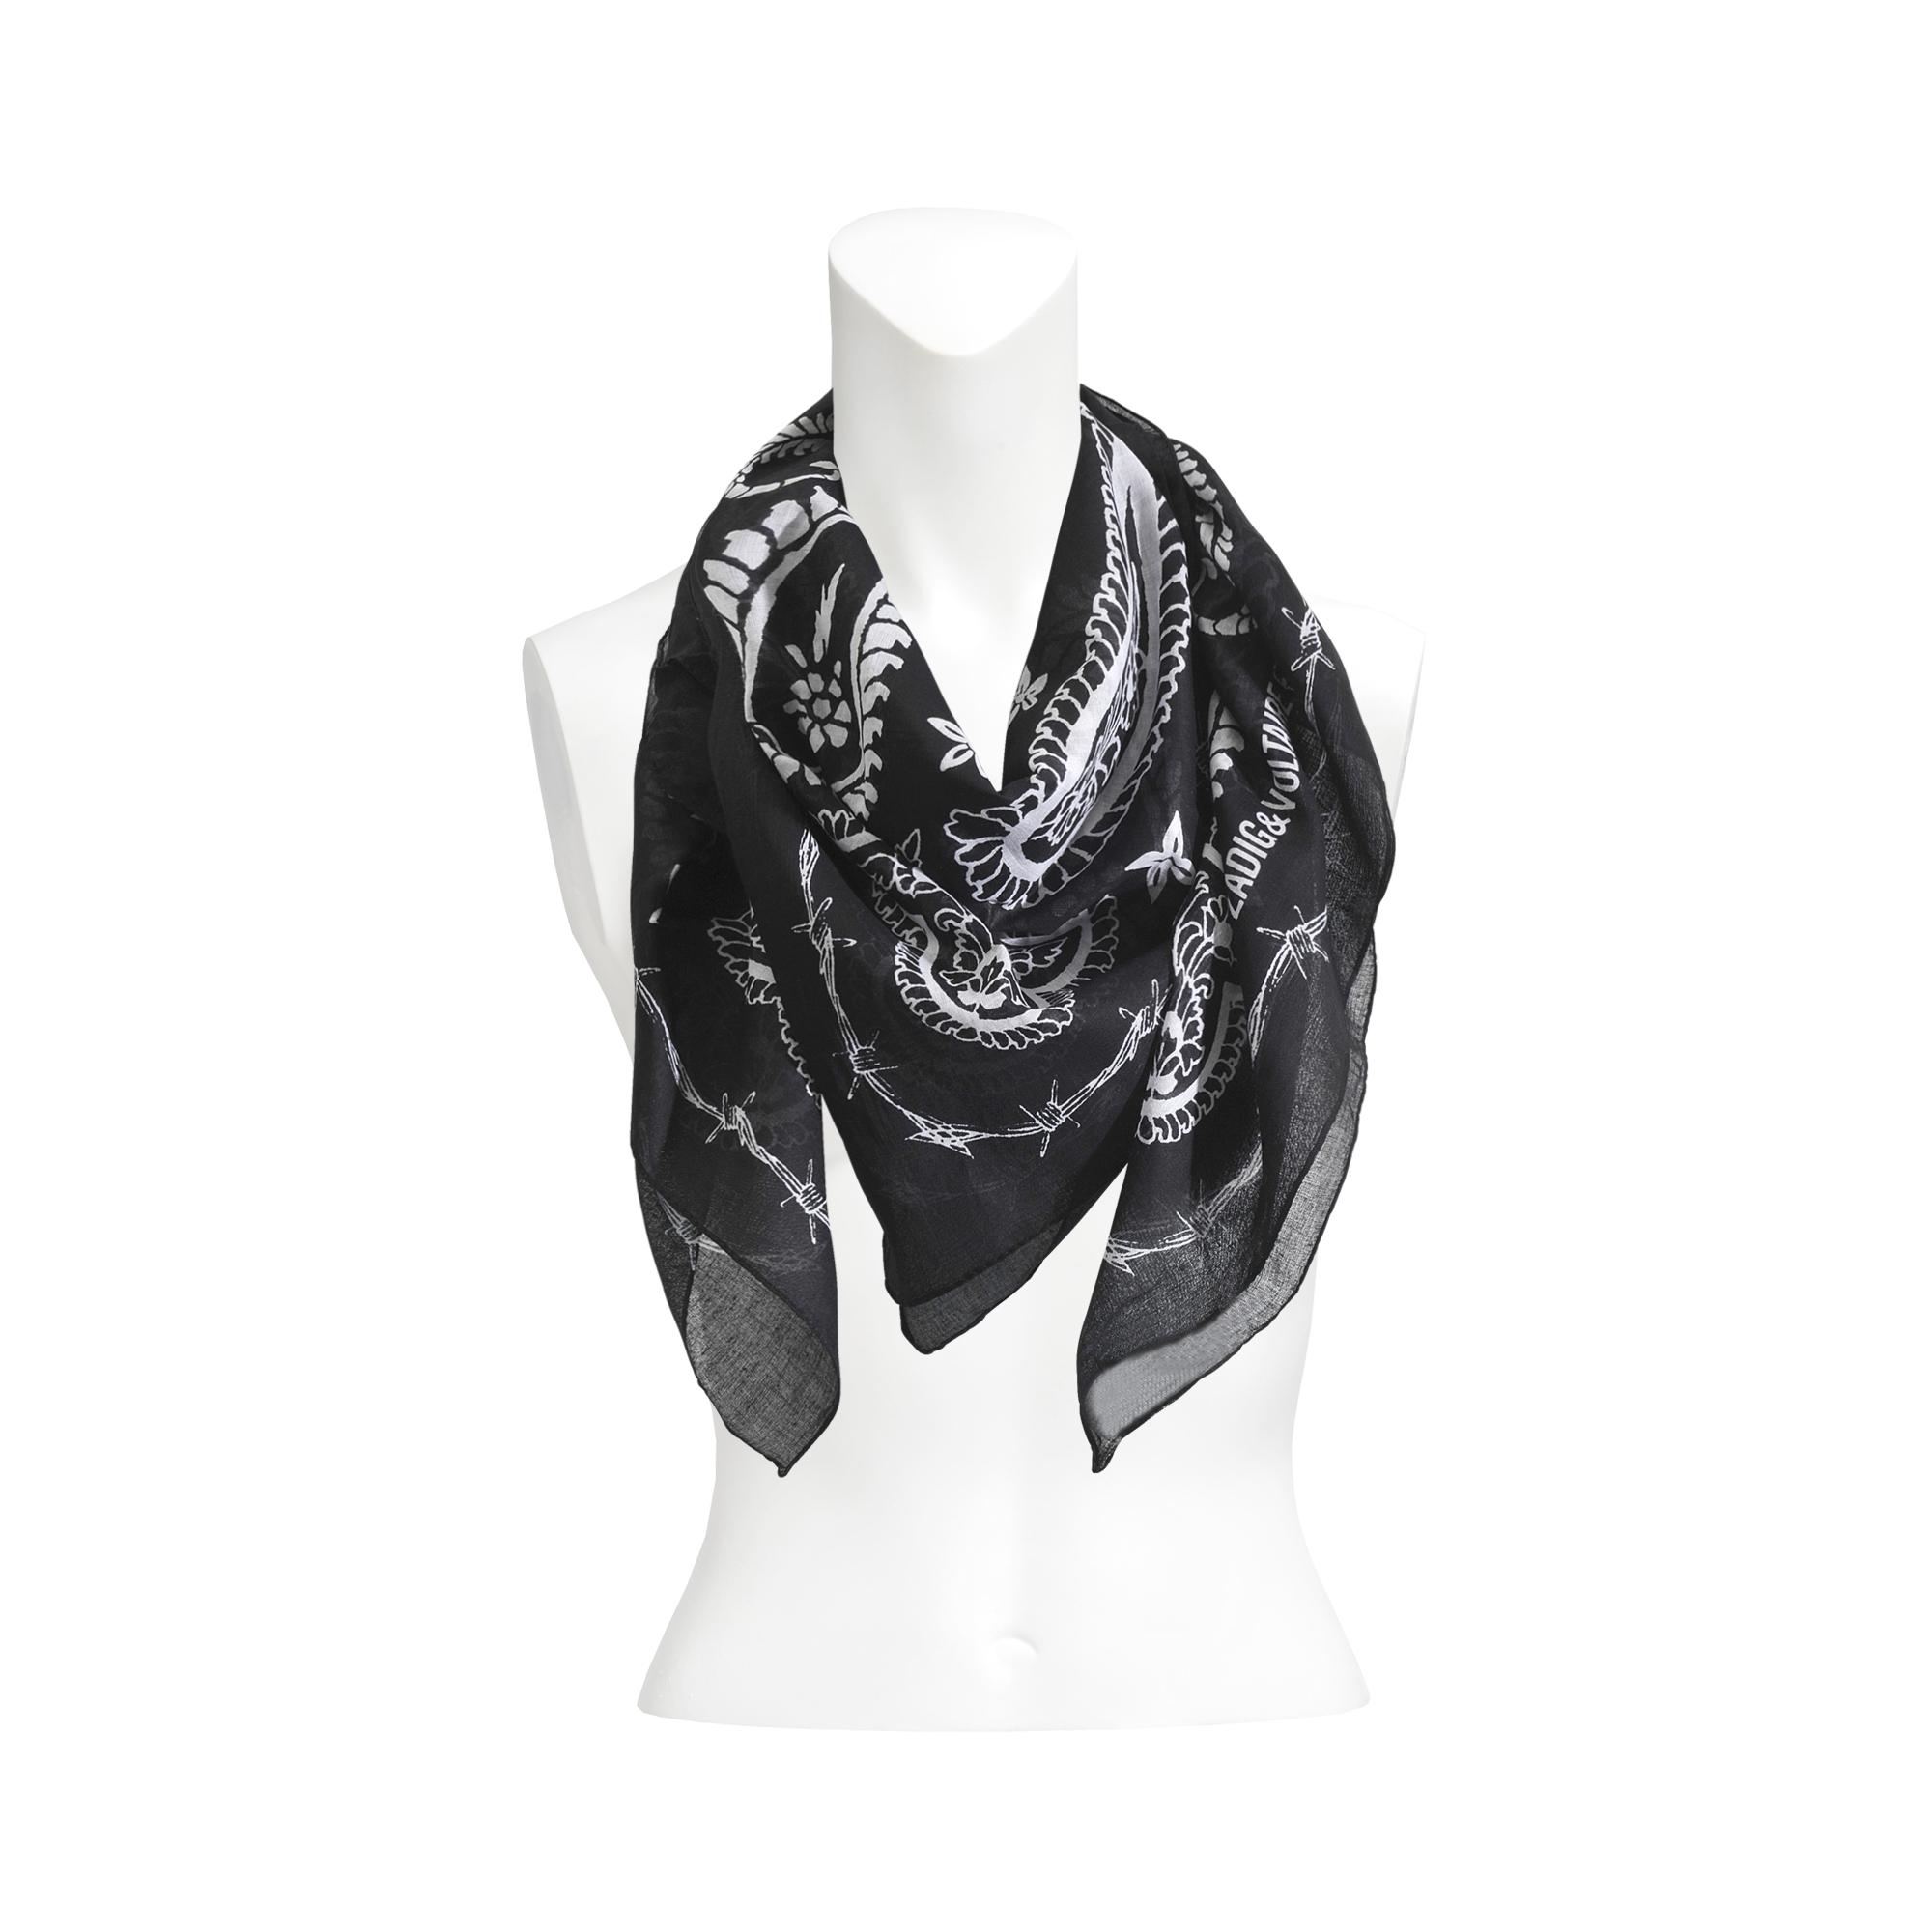 franco lyst scarf in sequin deluxe ferrari fullscreen schumacher stripe embellished accessories dorothee view